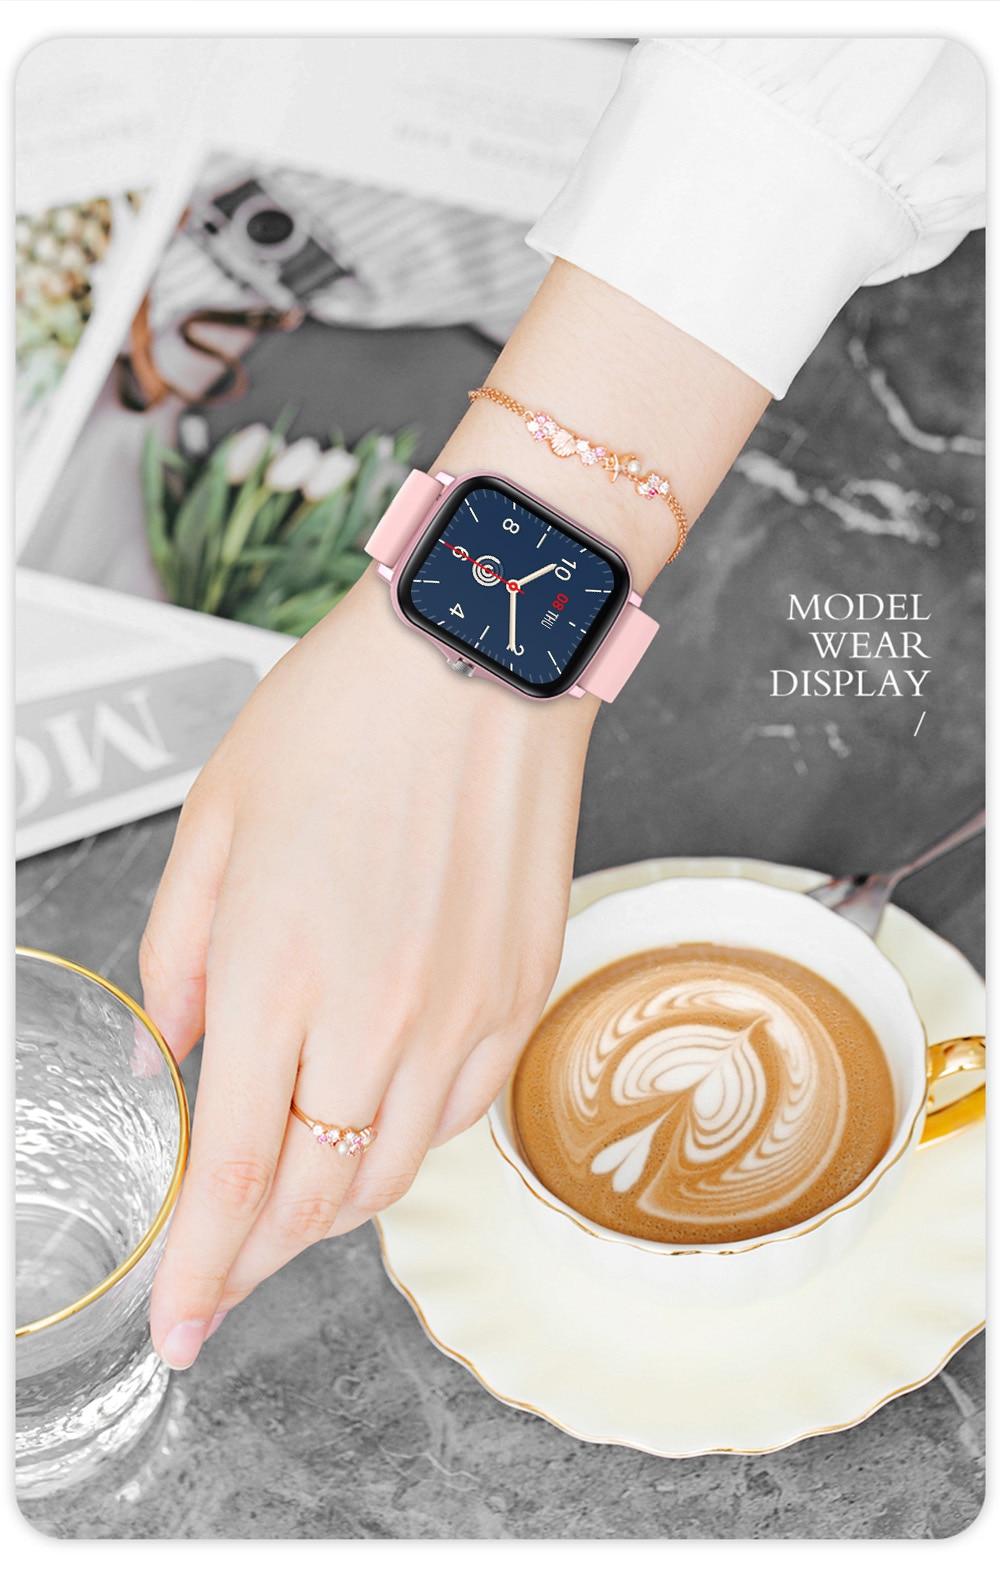 Ha9767b5c43824cb4a76139381401edbes COLMI P8 Plus 1.69 inch 2021 Smart Watch Men Full Touch Fitness Tracker IP67 waterproof Women GTS 2 Smartwatch for Xiaomi phone